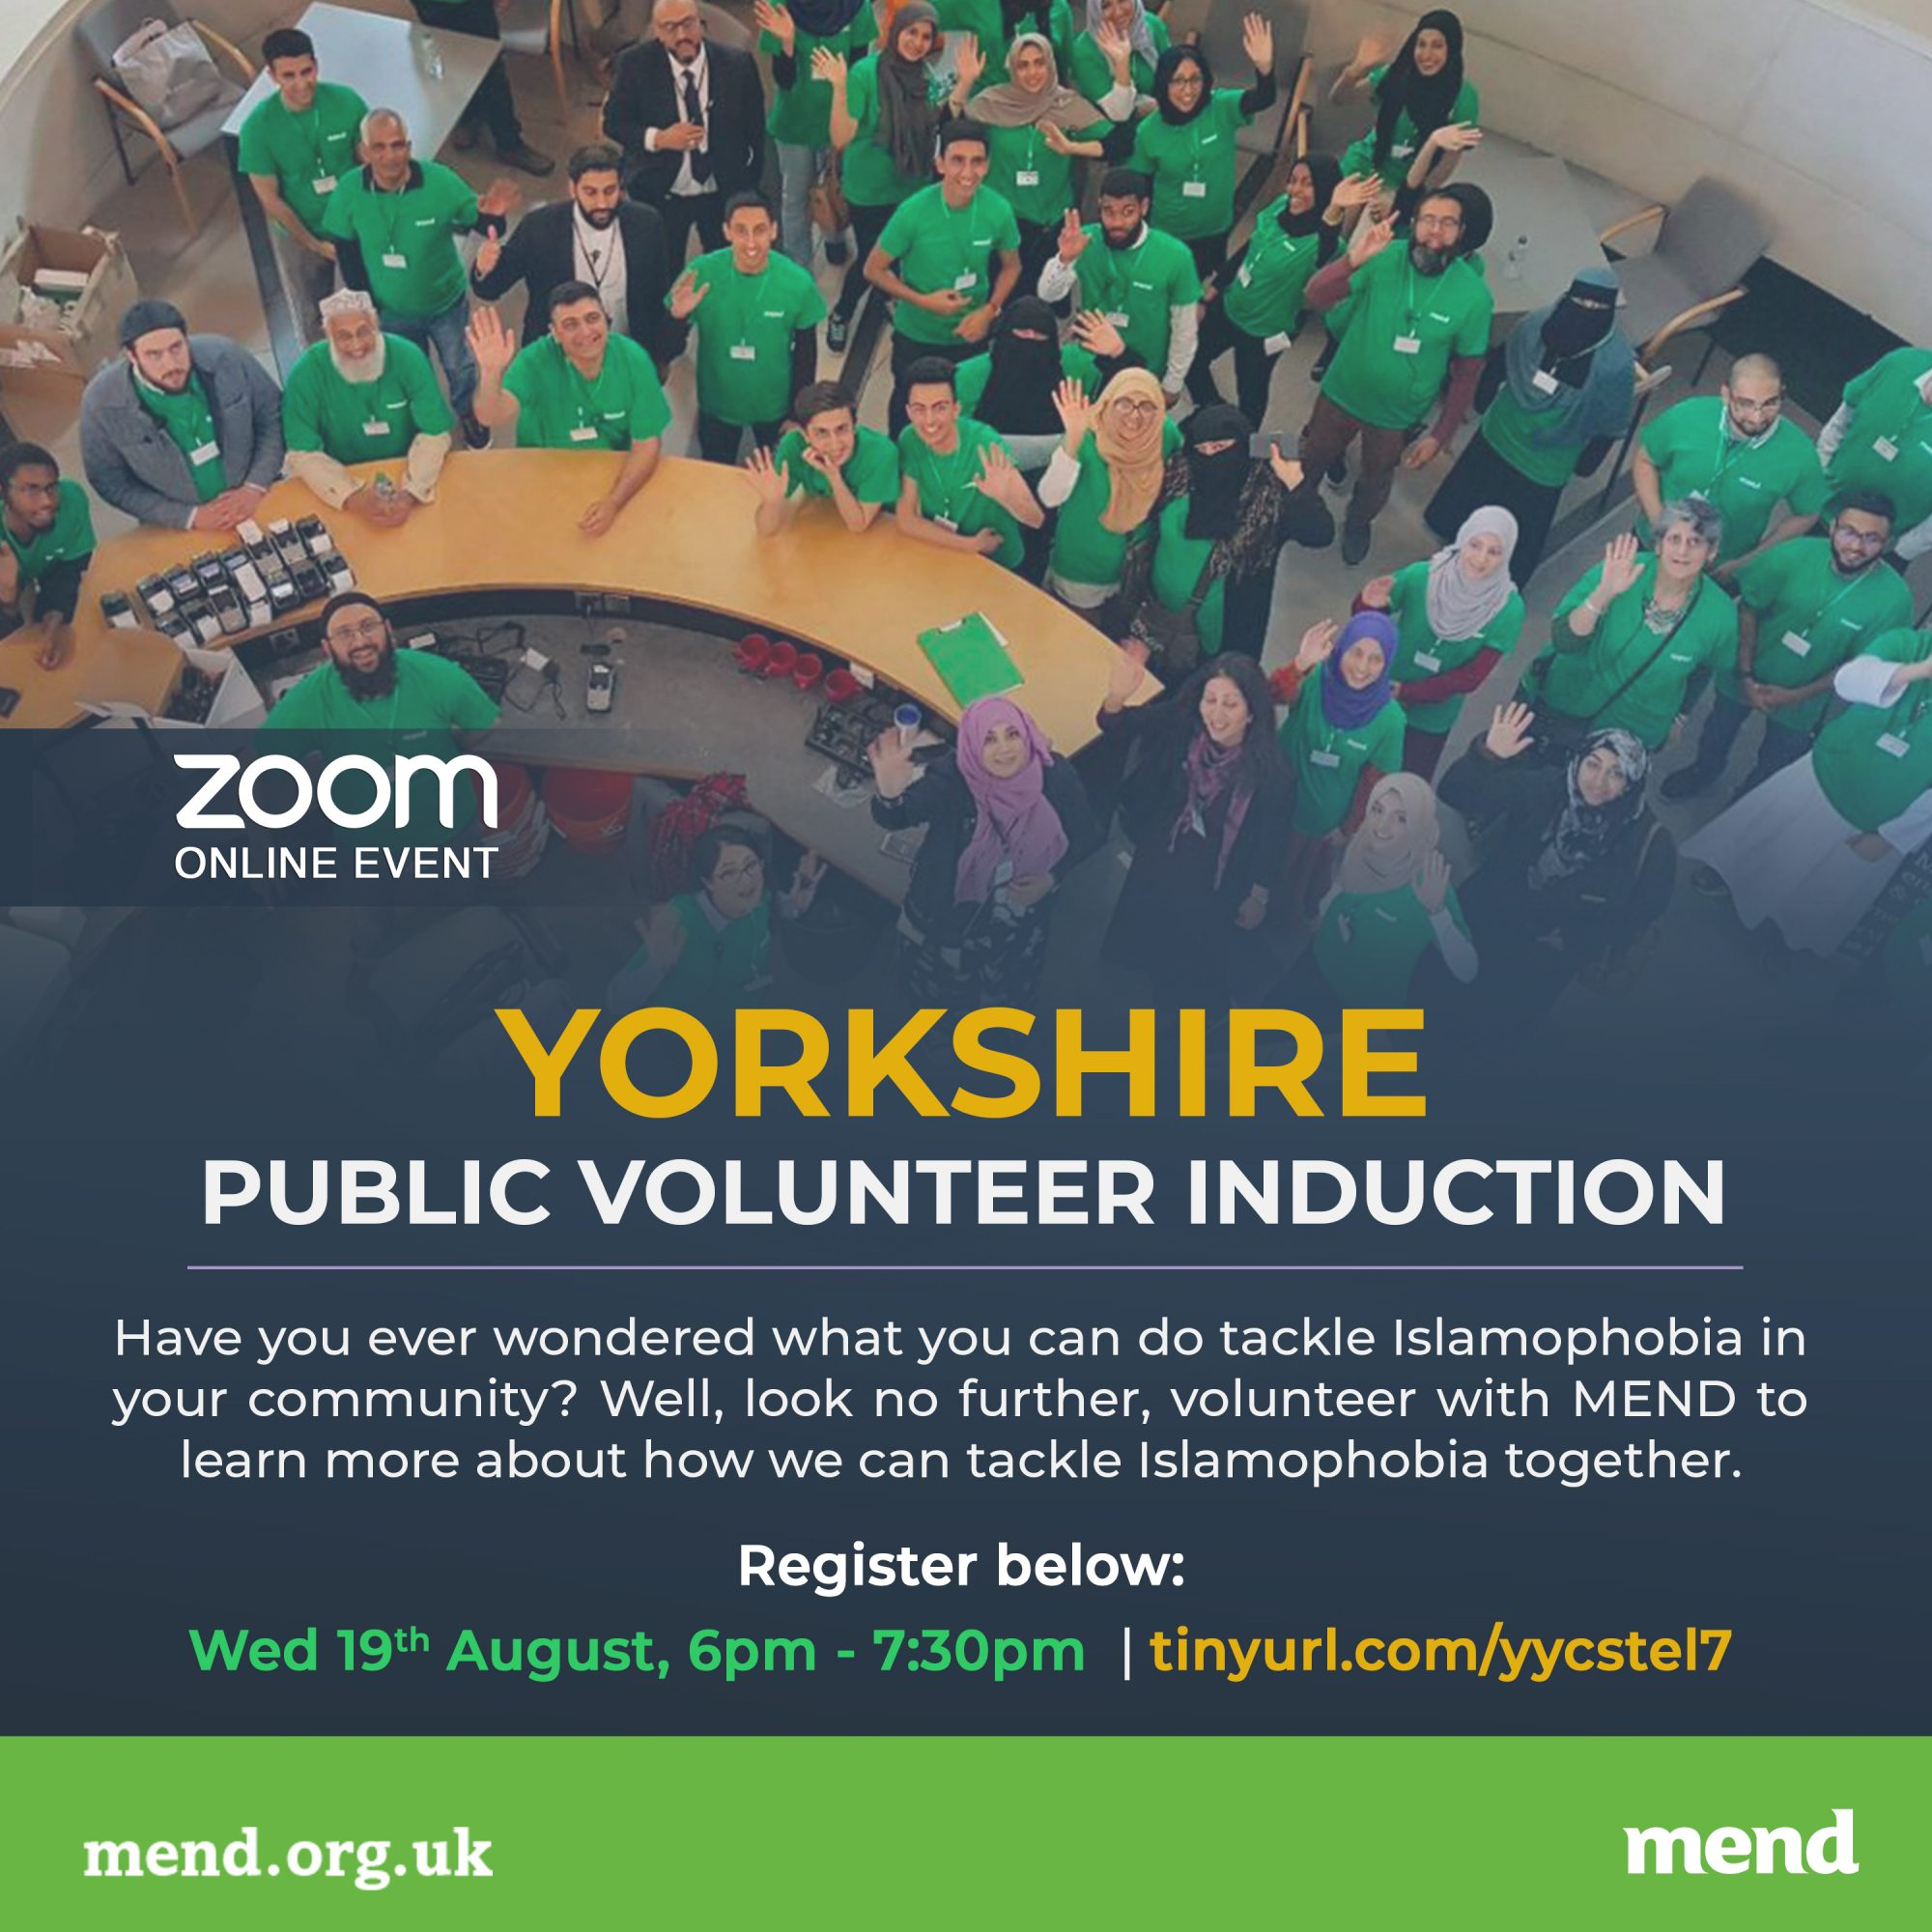 MEND Yorkshire Volunteer Induction